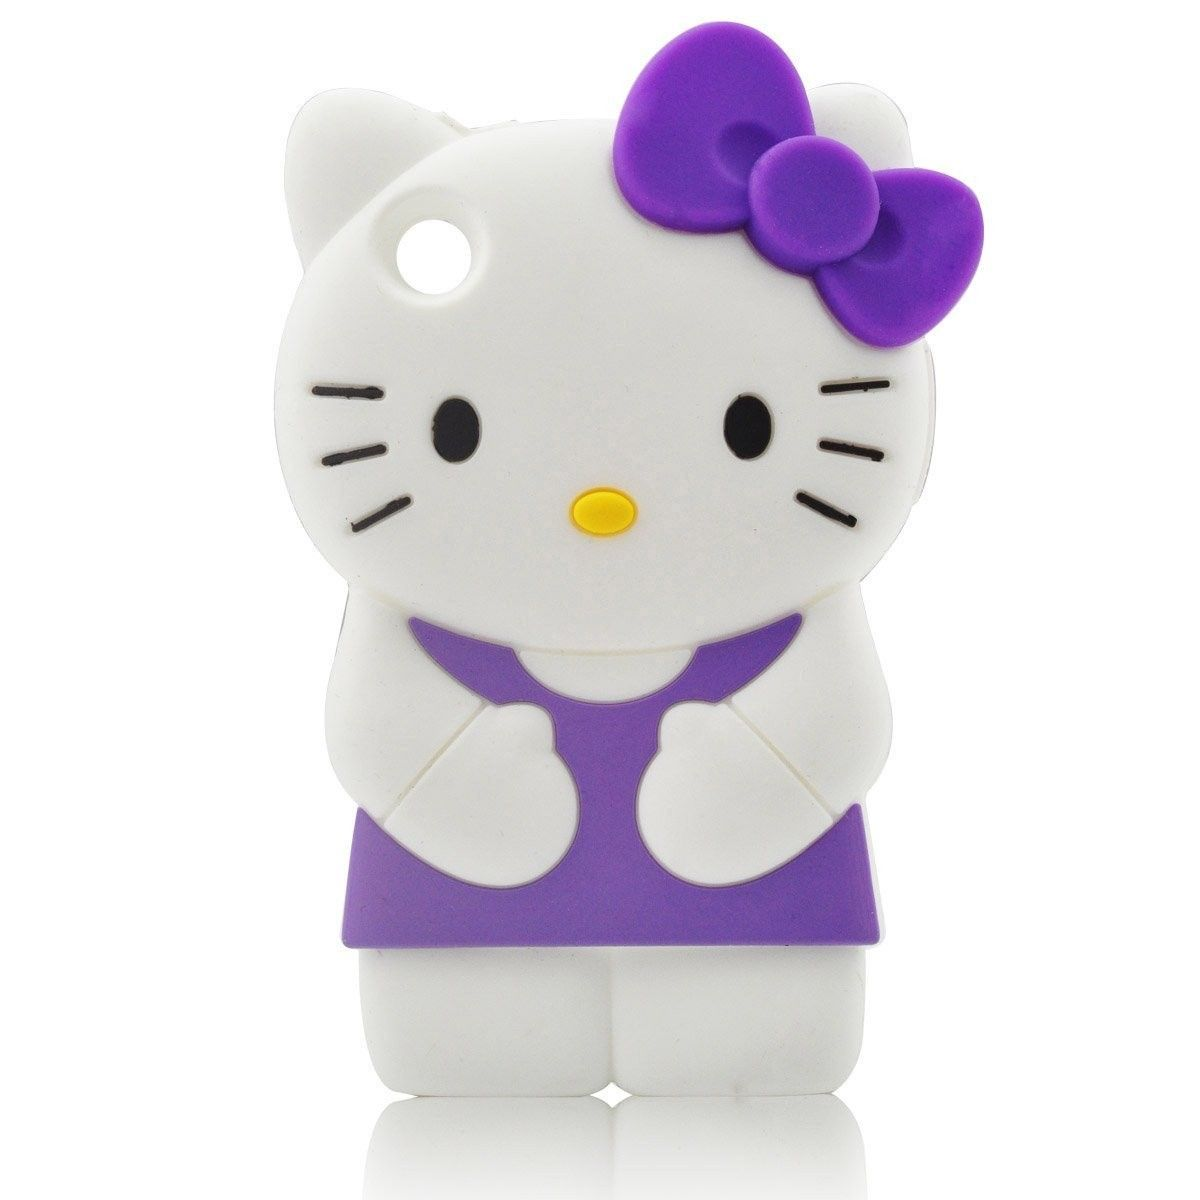 Beautiful Wallpaper Hello Kitty Ipod Touch - 294f6b5a9e0fcdccc50234f9e565fc8b  Pic_91981.jpg